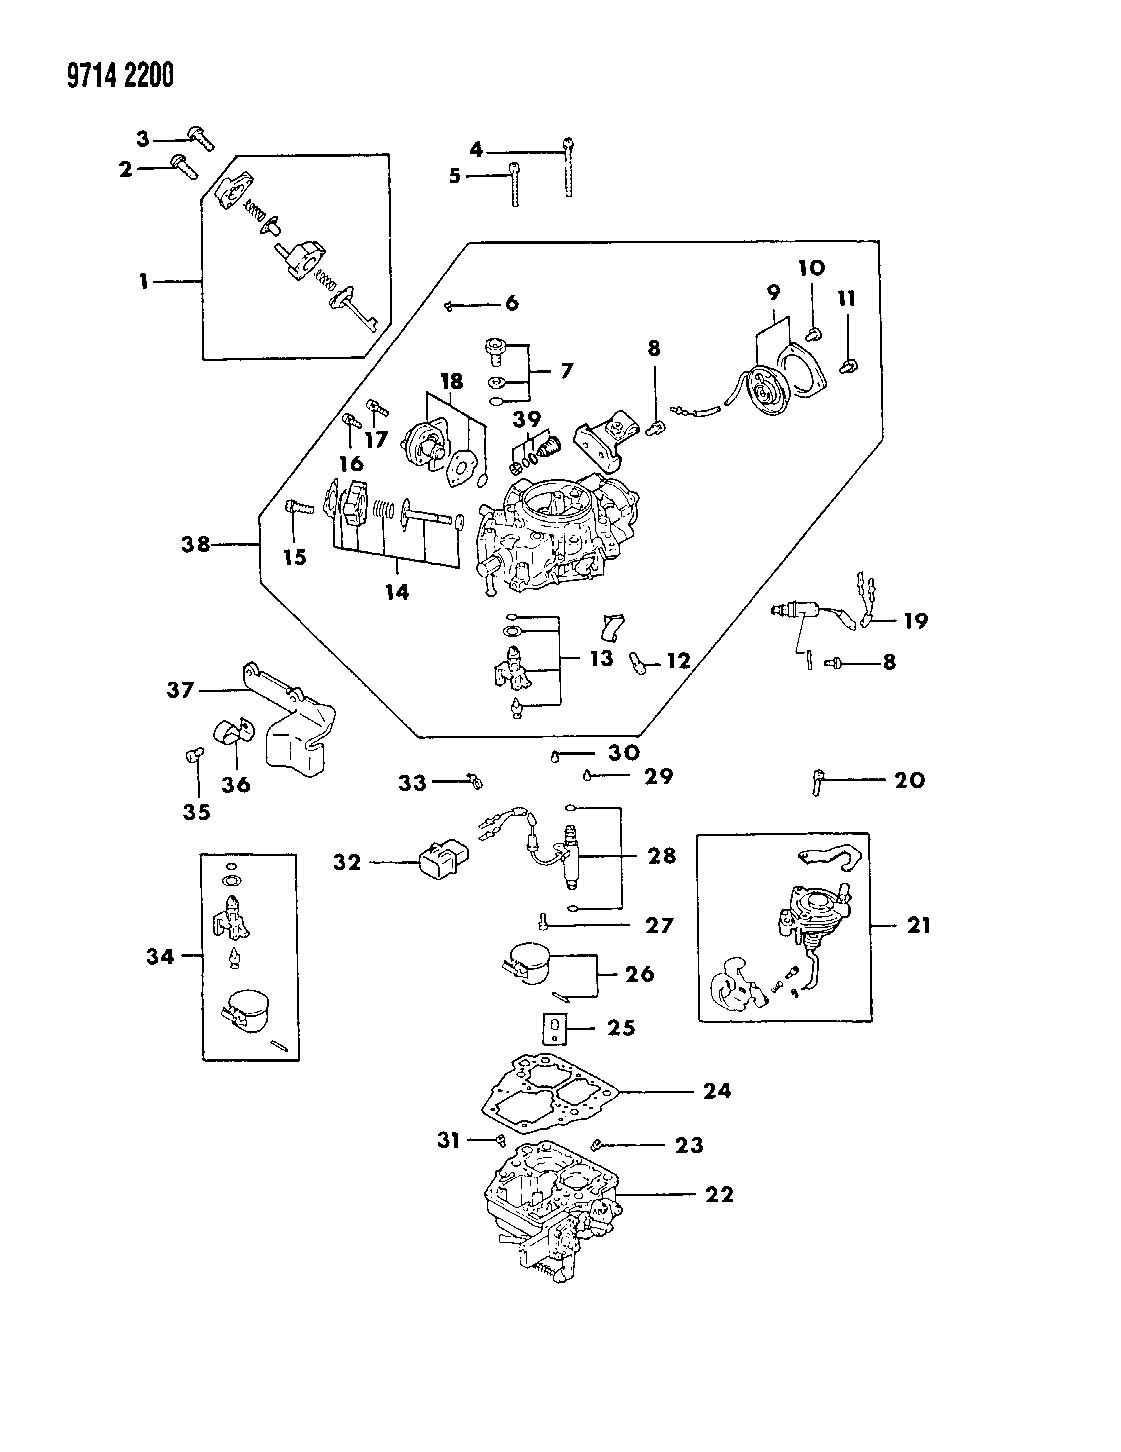 1998 Dodge Truck Wiring Diagram Http Wwwjustanswercom Classiccars